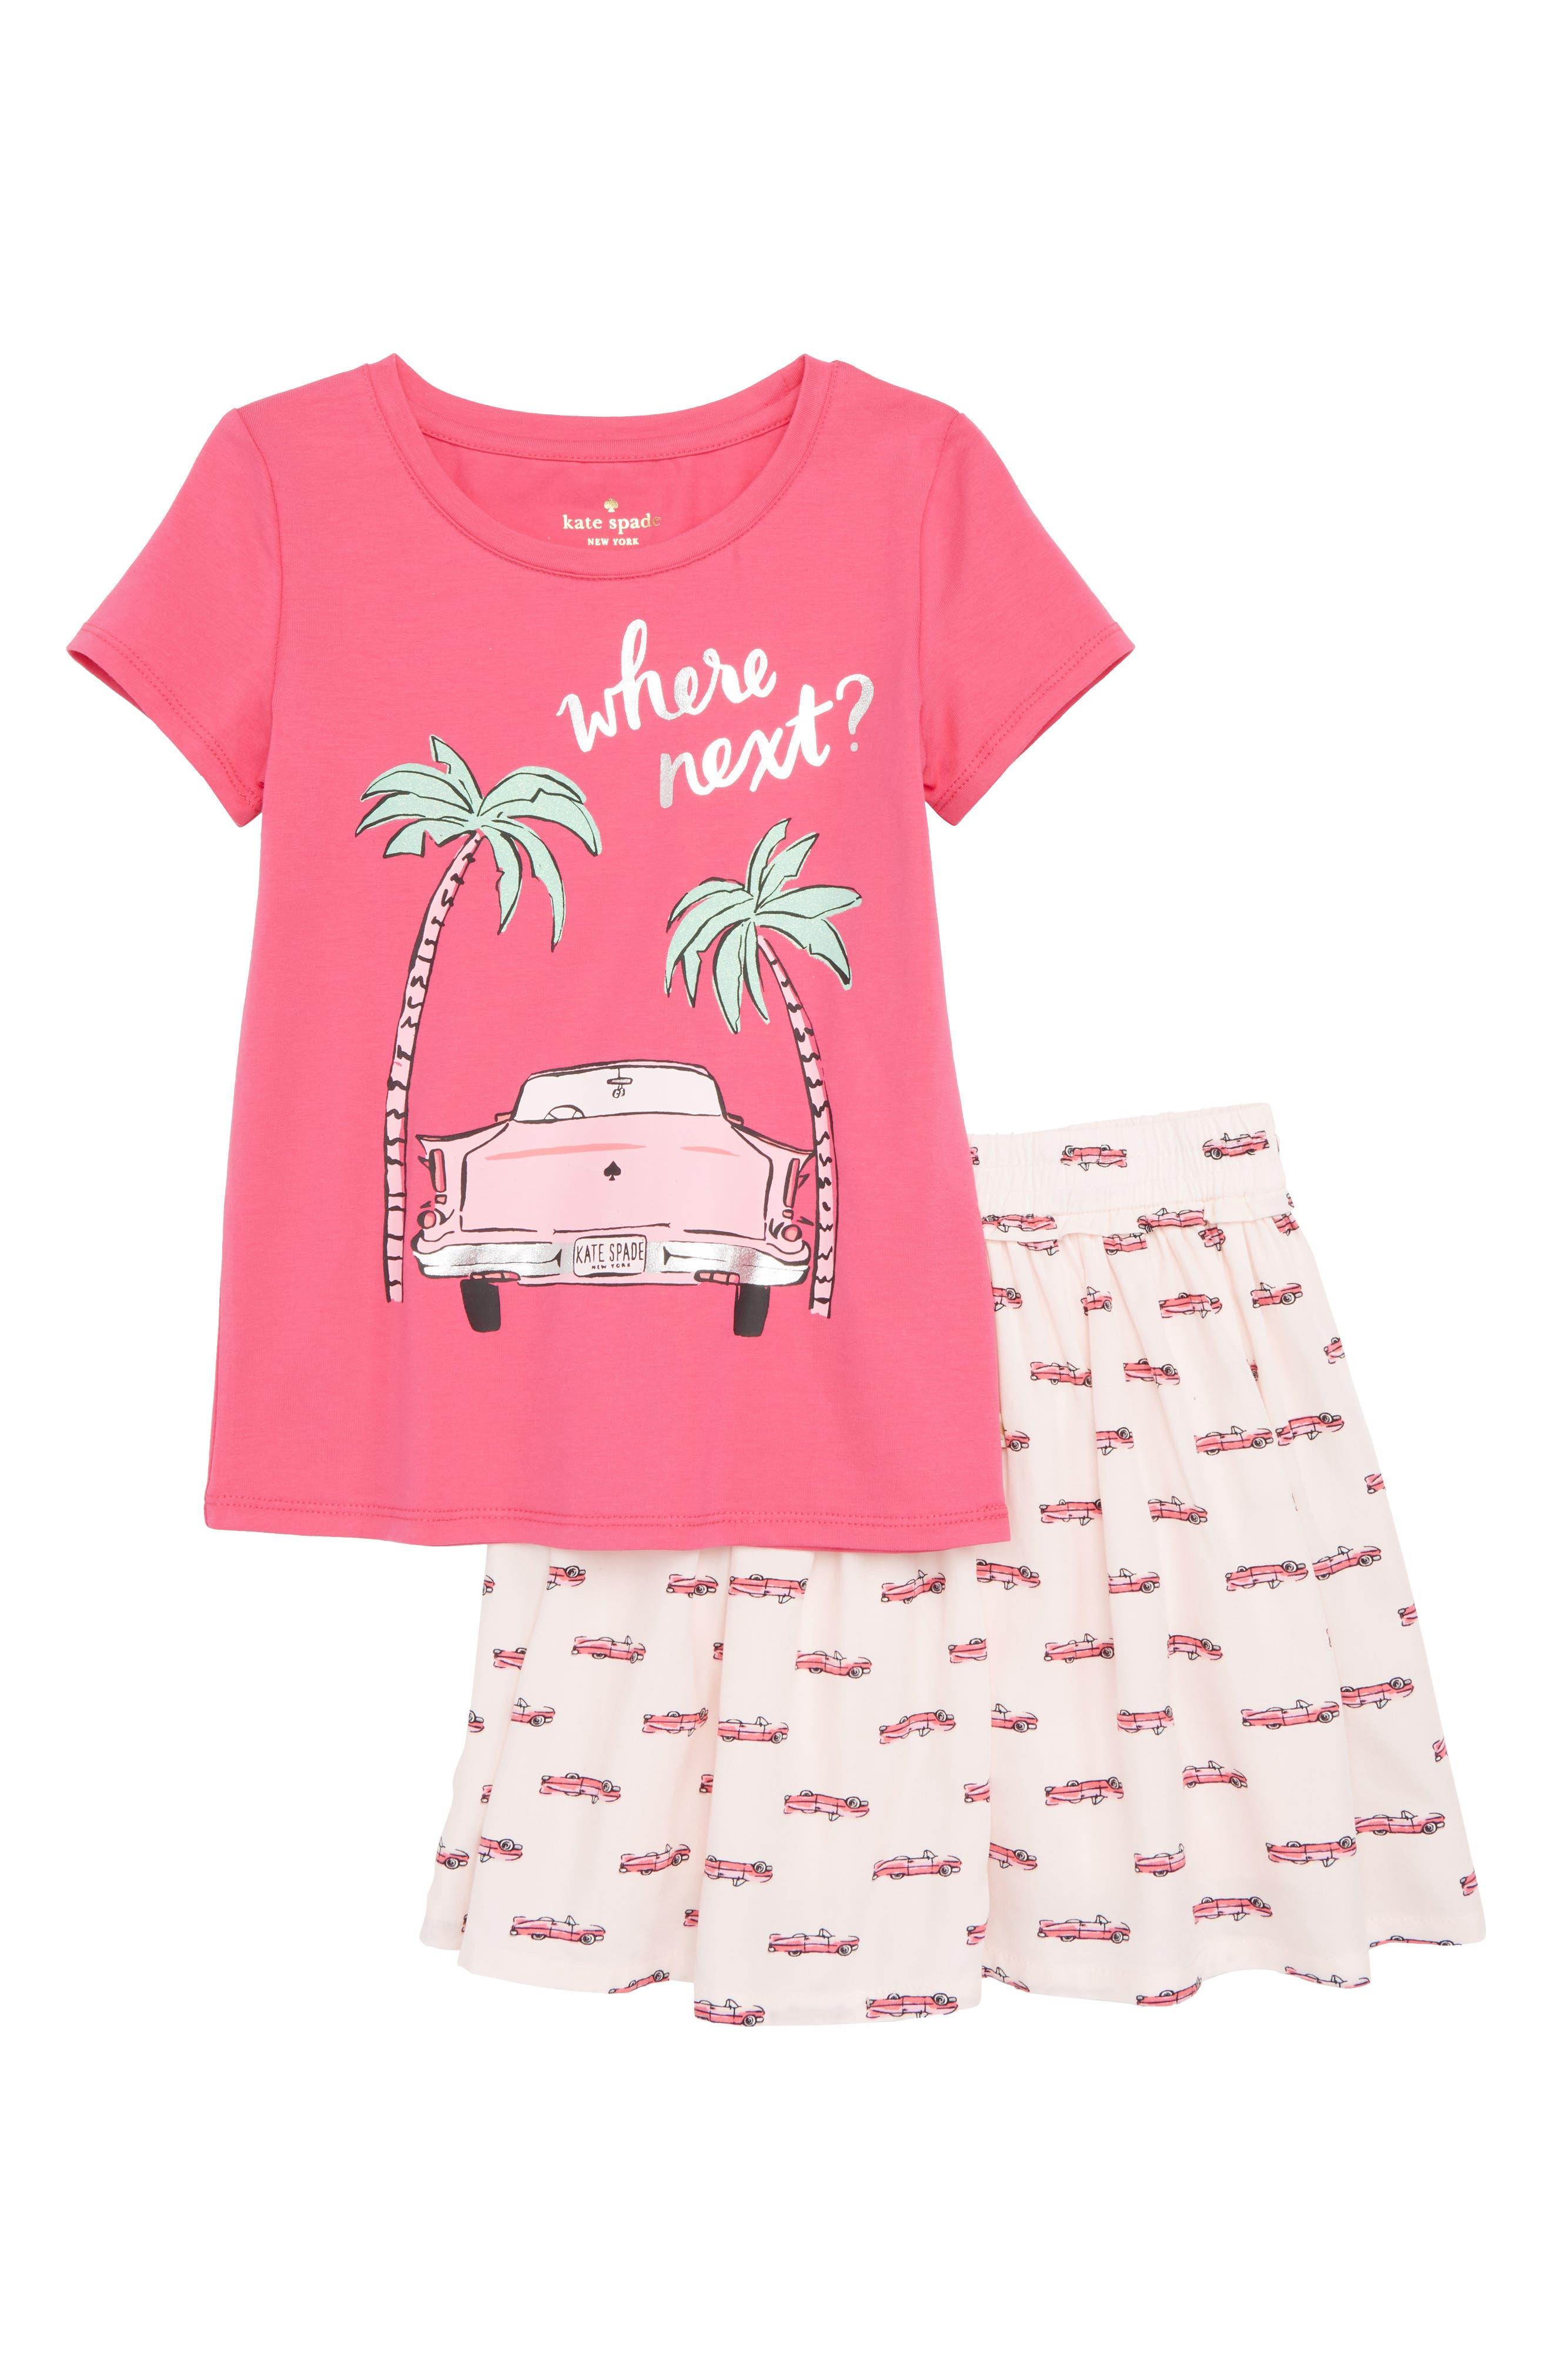 kate spade new york where next top & skirt set (Toddler Girls & Little Girls)